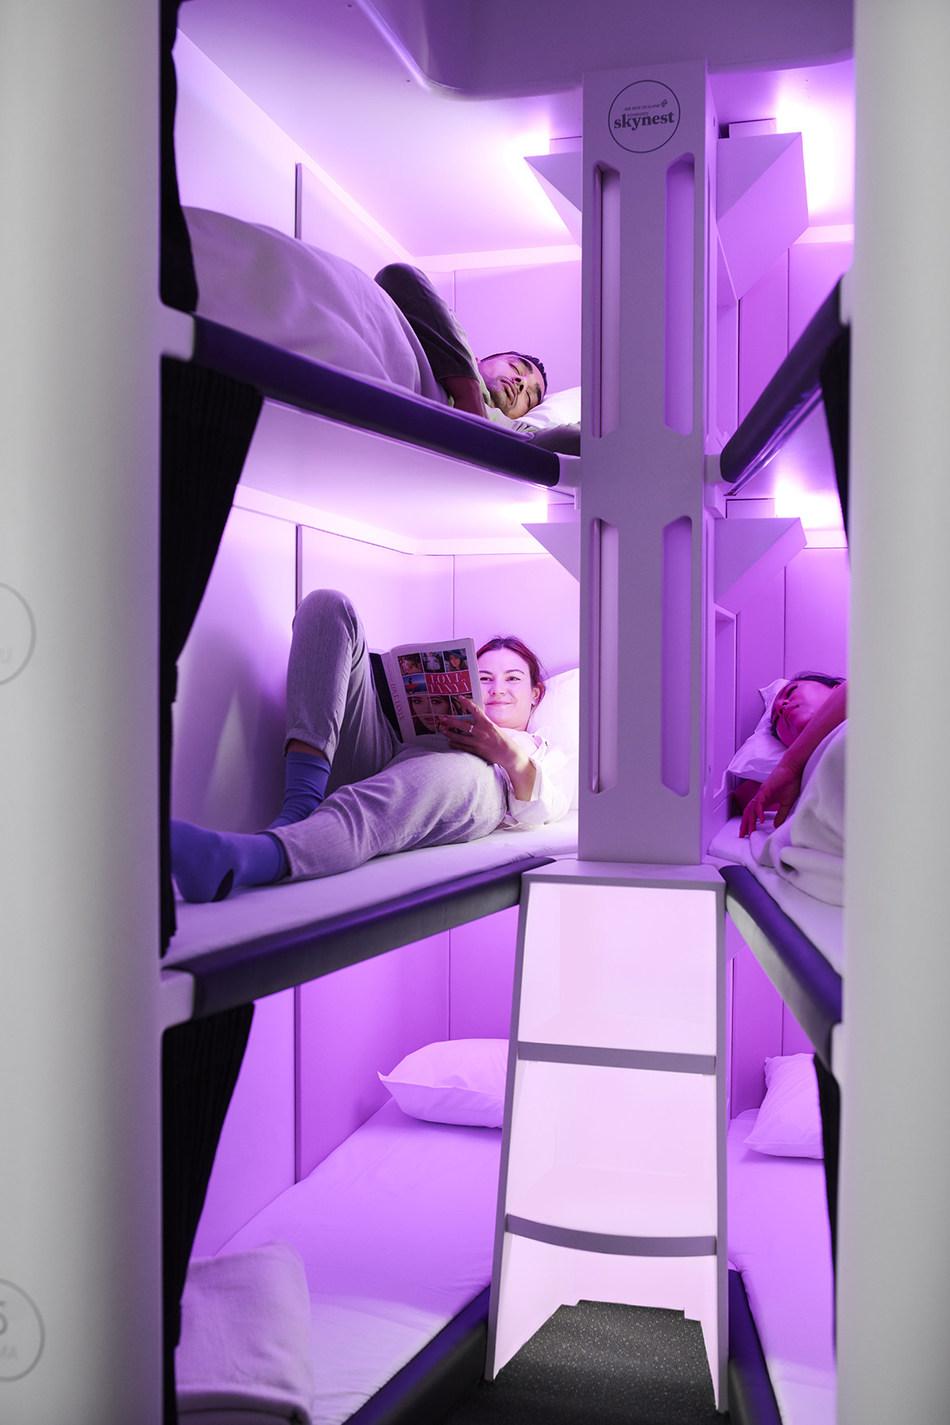 The Economy Skynest. (CNW Group/Air New Zealand)